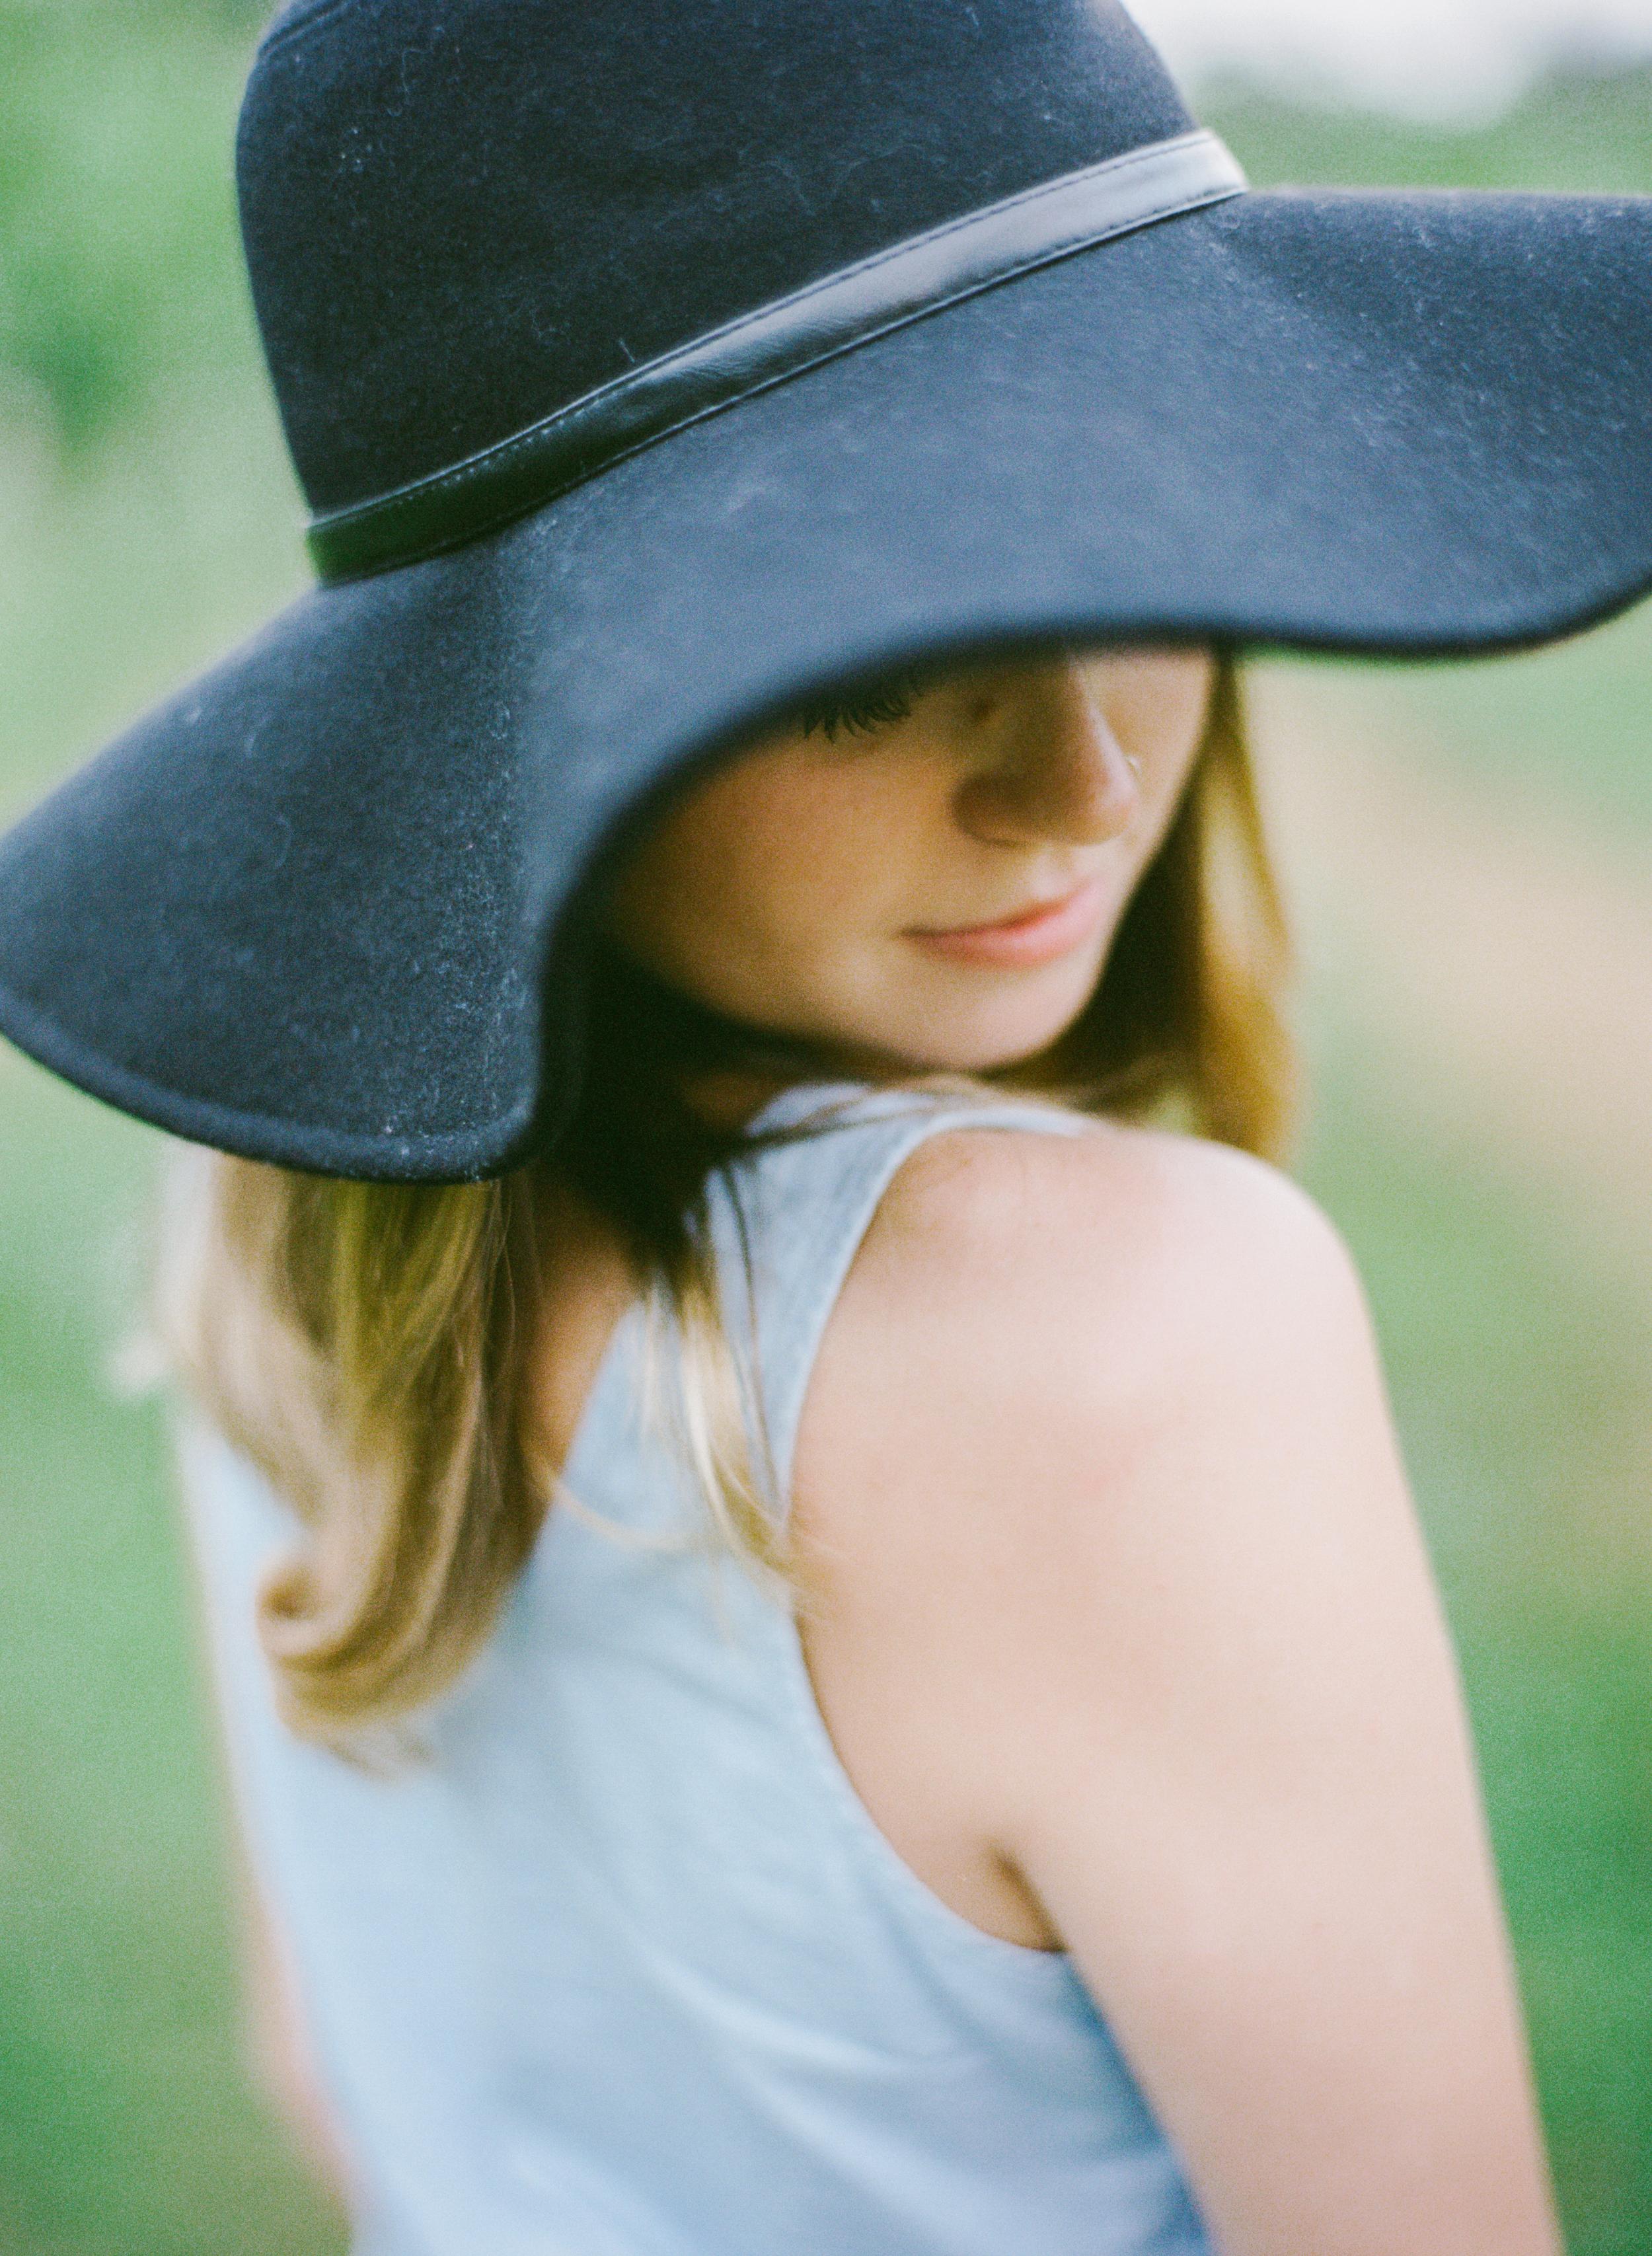 Katie_Editorial_lookbook_fall_fashion_charlottesville_Zachary Taylor_Fine_Art_Wedding_Photographer-3.jpg